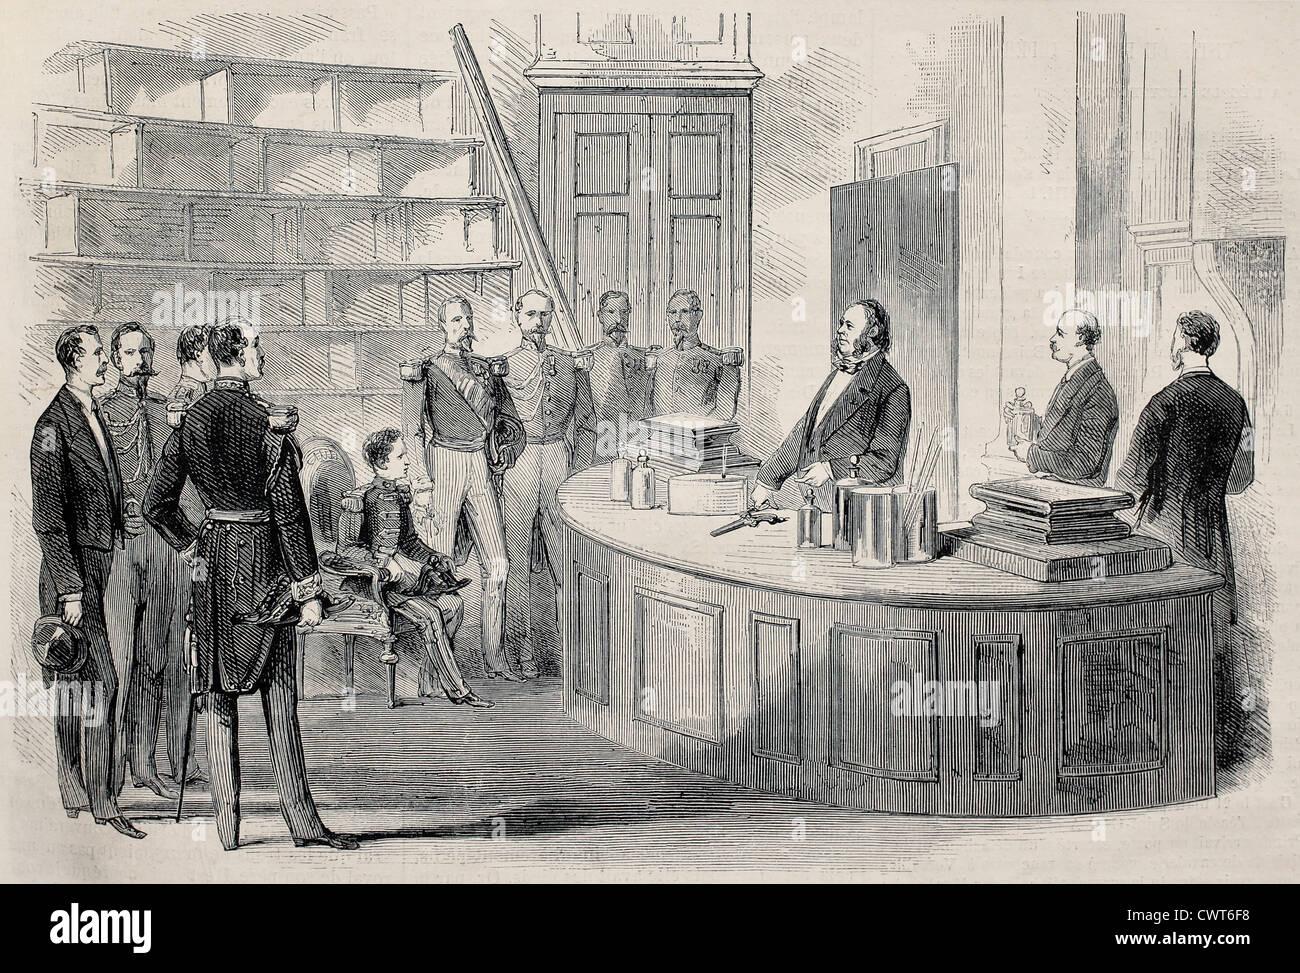 Prince Imperial besuchen Chemie-Labor Stockbild